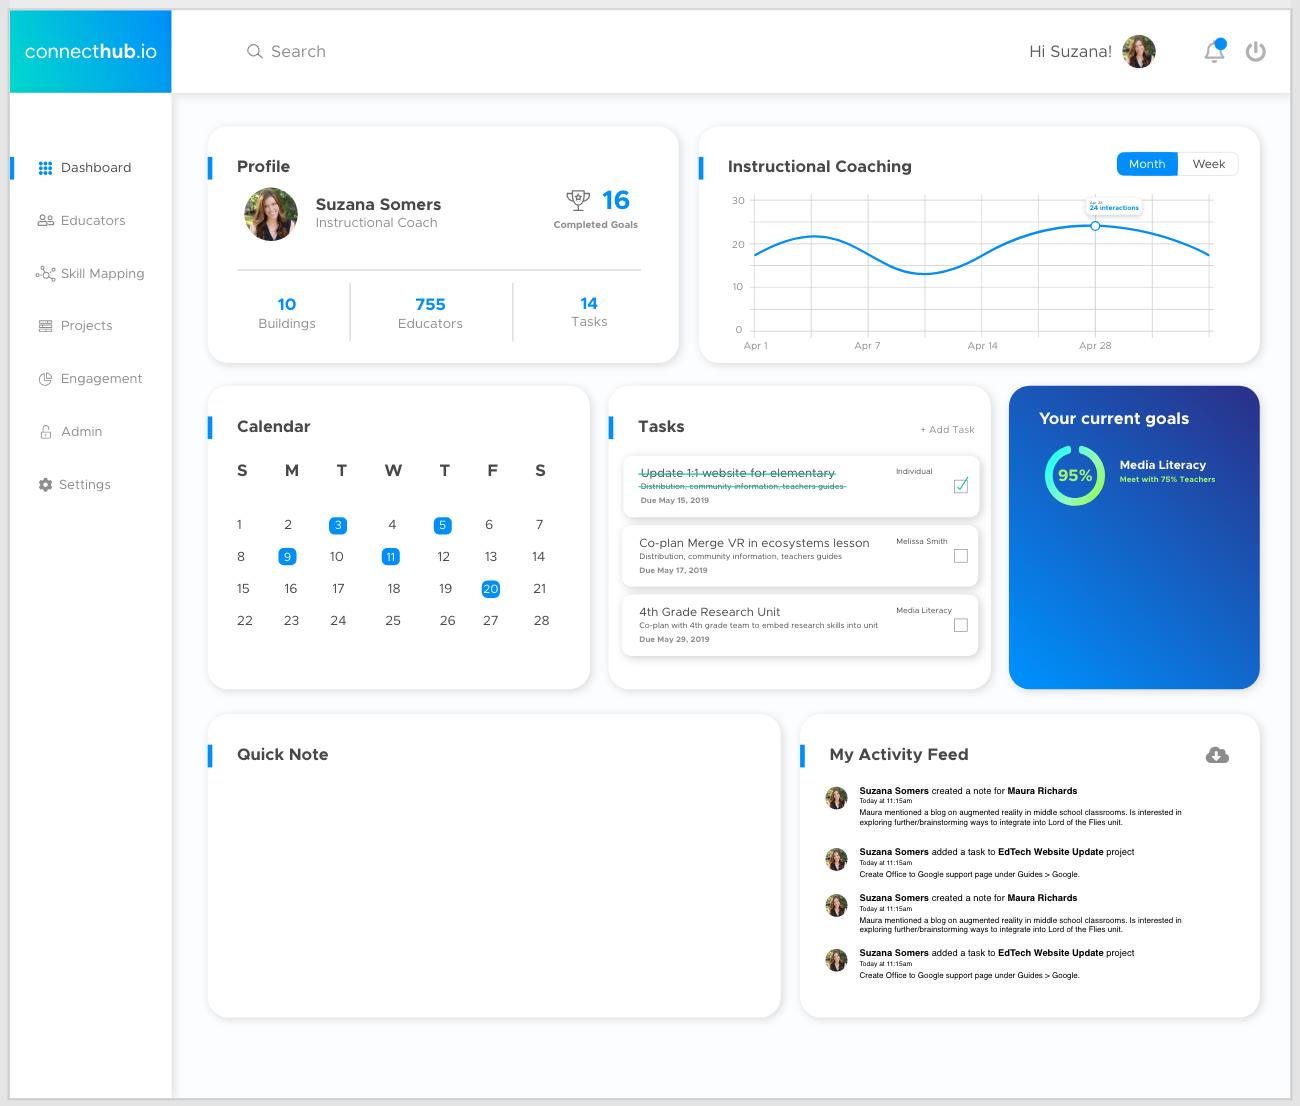 connecthub.io - Instructional Coaching Tool